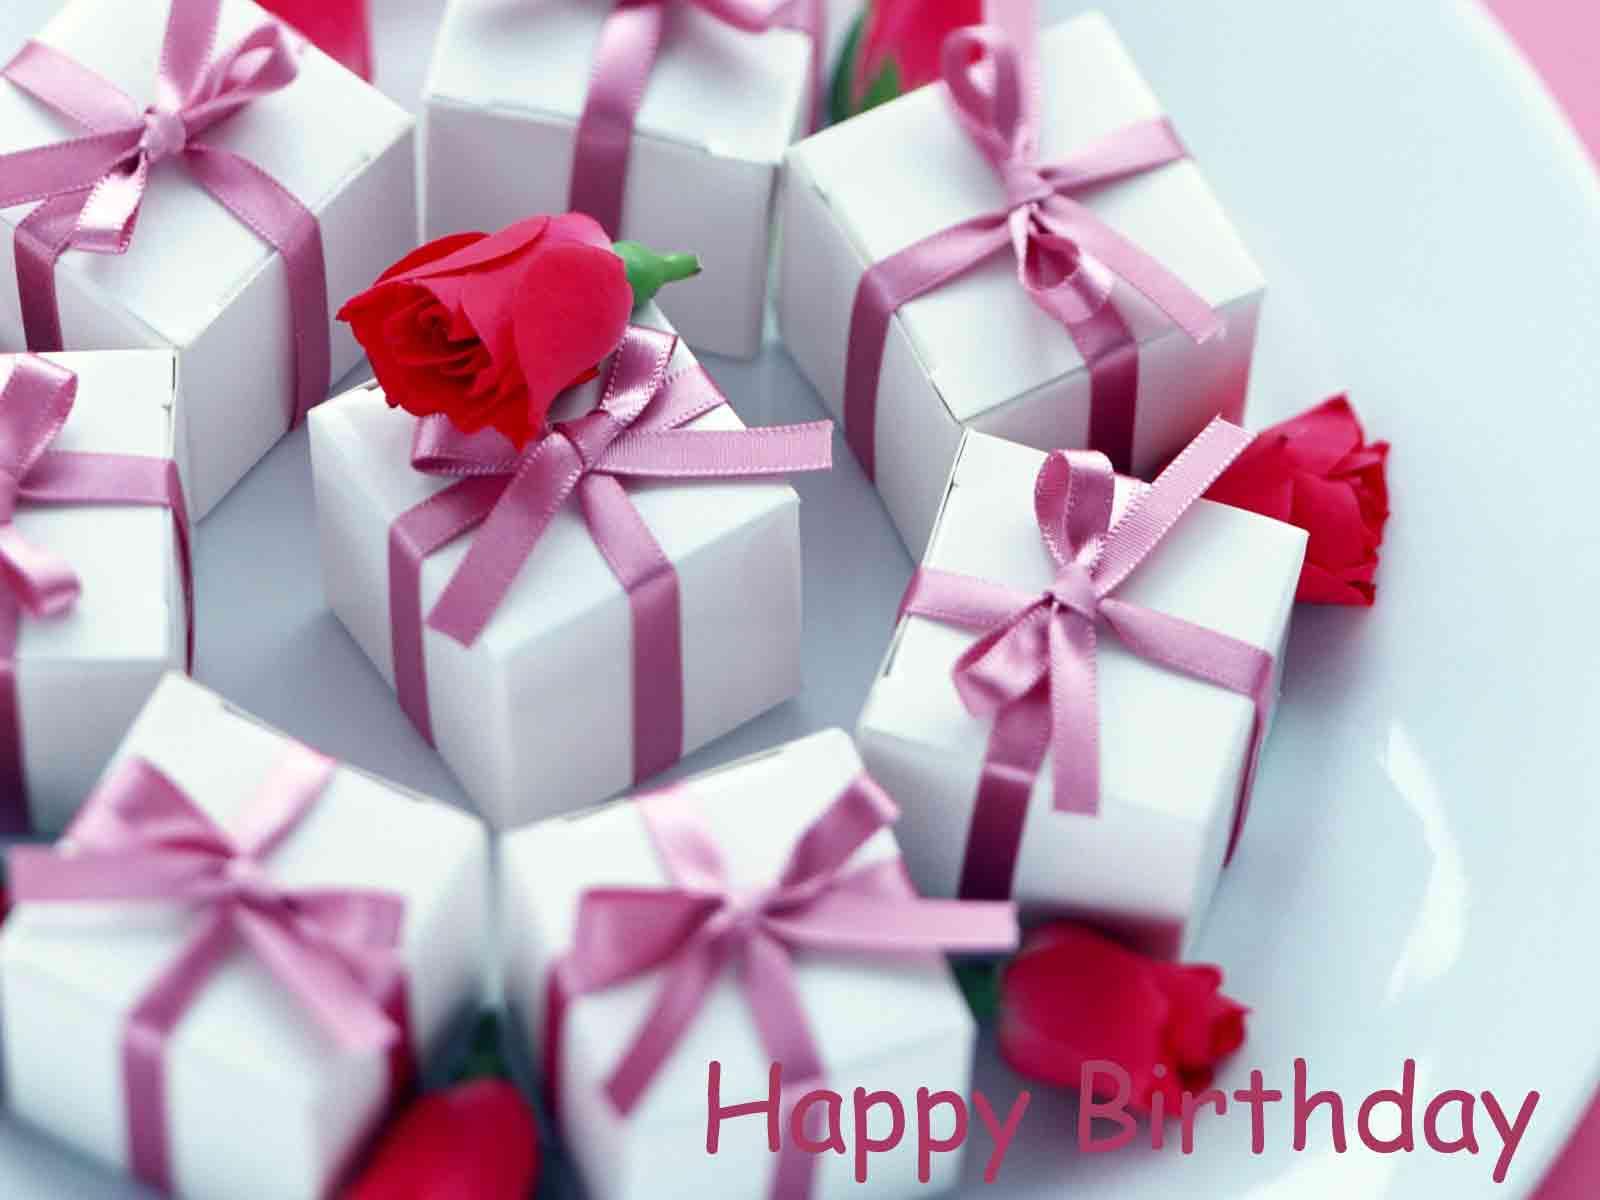 http://4.bp.blogspot.com/-6oUBFDNu0LU/UUXrgrrQkSI/AAAAAAABMjQ/25_a8iPl8JA/s1600/hinh+nen+sinh+nhat,+happy+birthday+wallpaper+(12).jpg